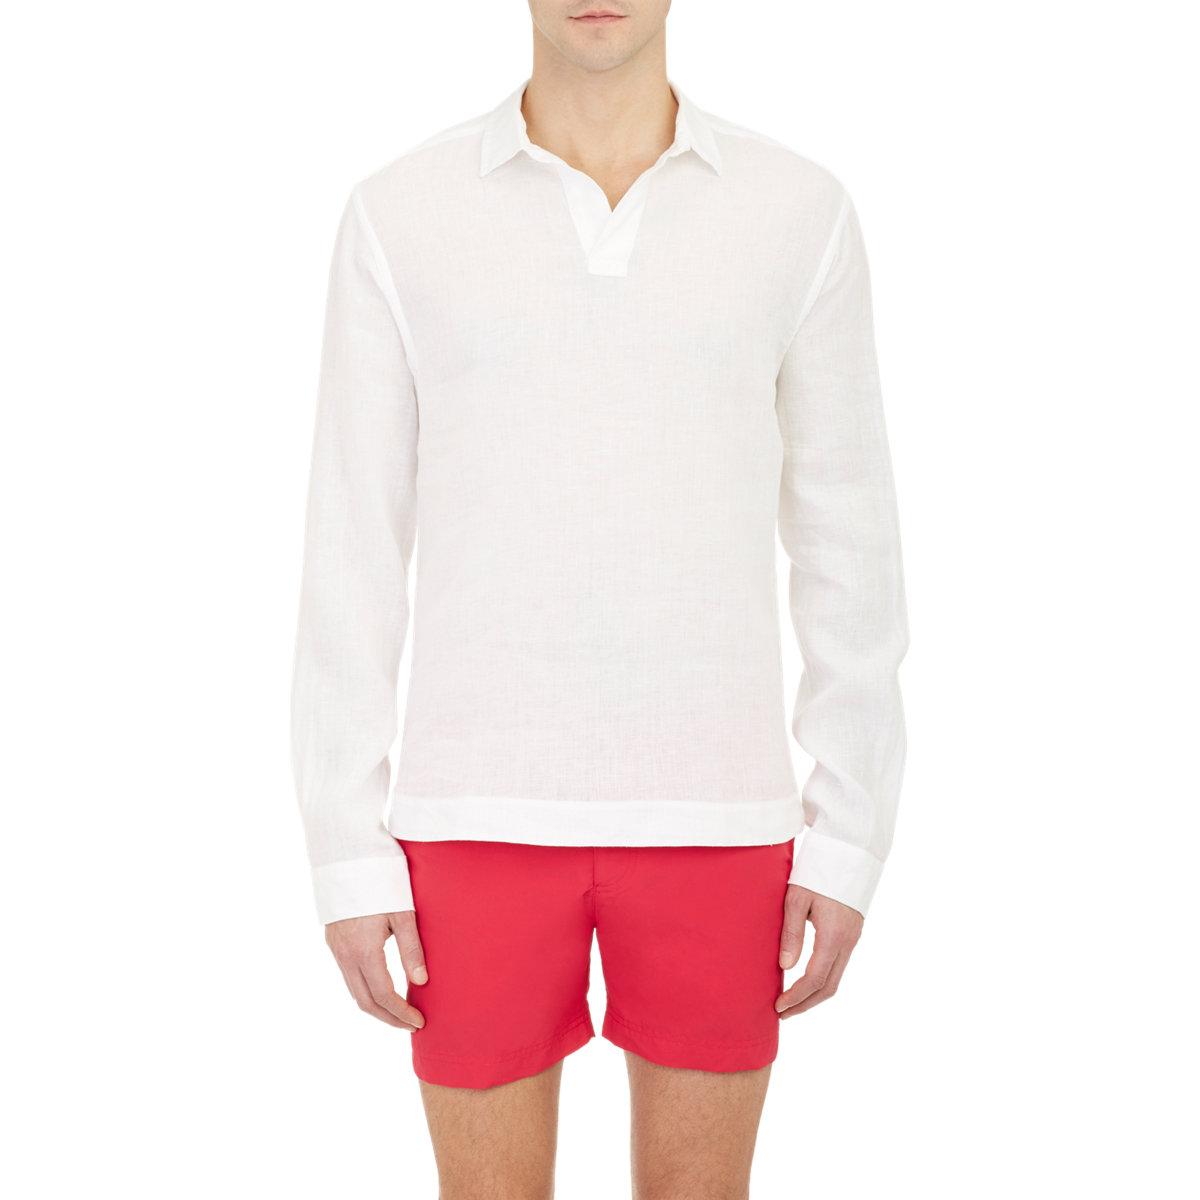 Orlebar brown slub ridley shirt in white for men lyst for What is a slub shirt